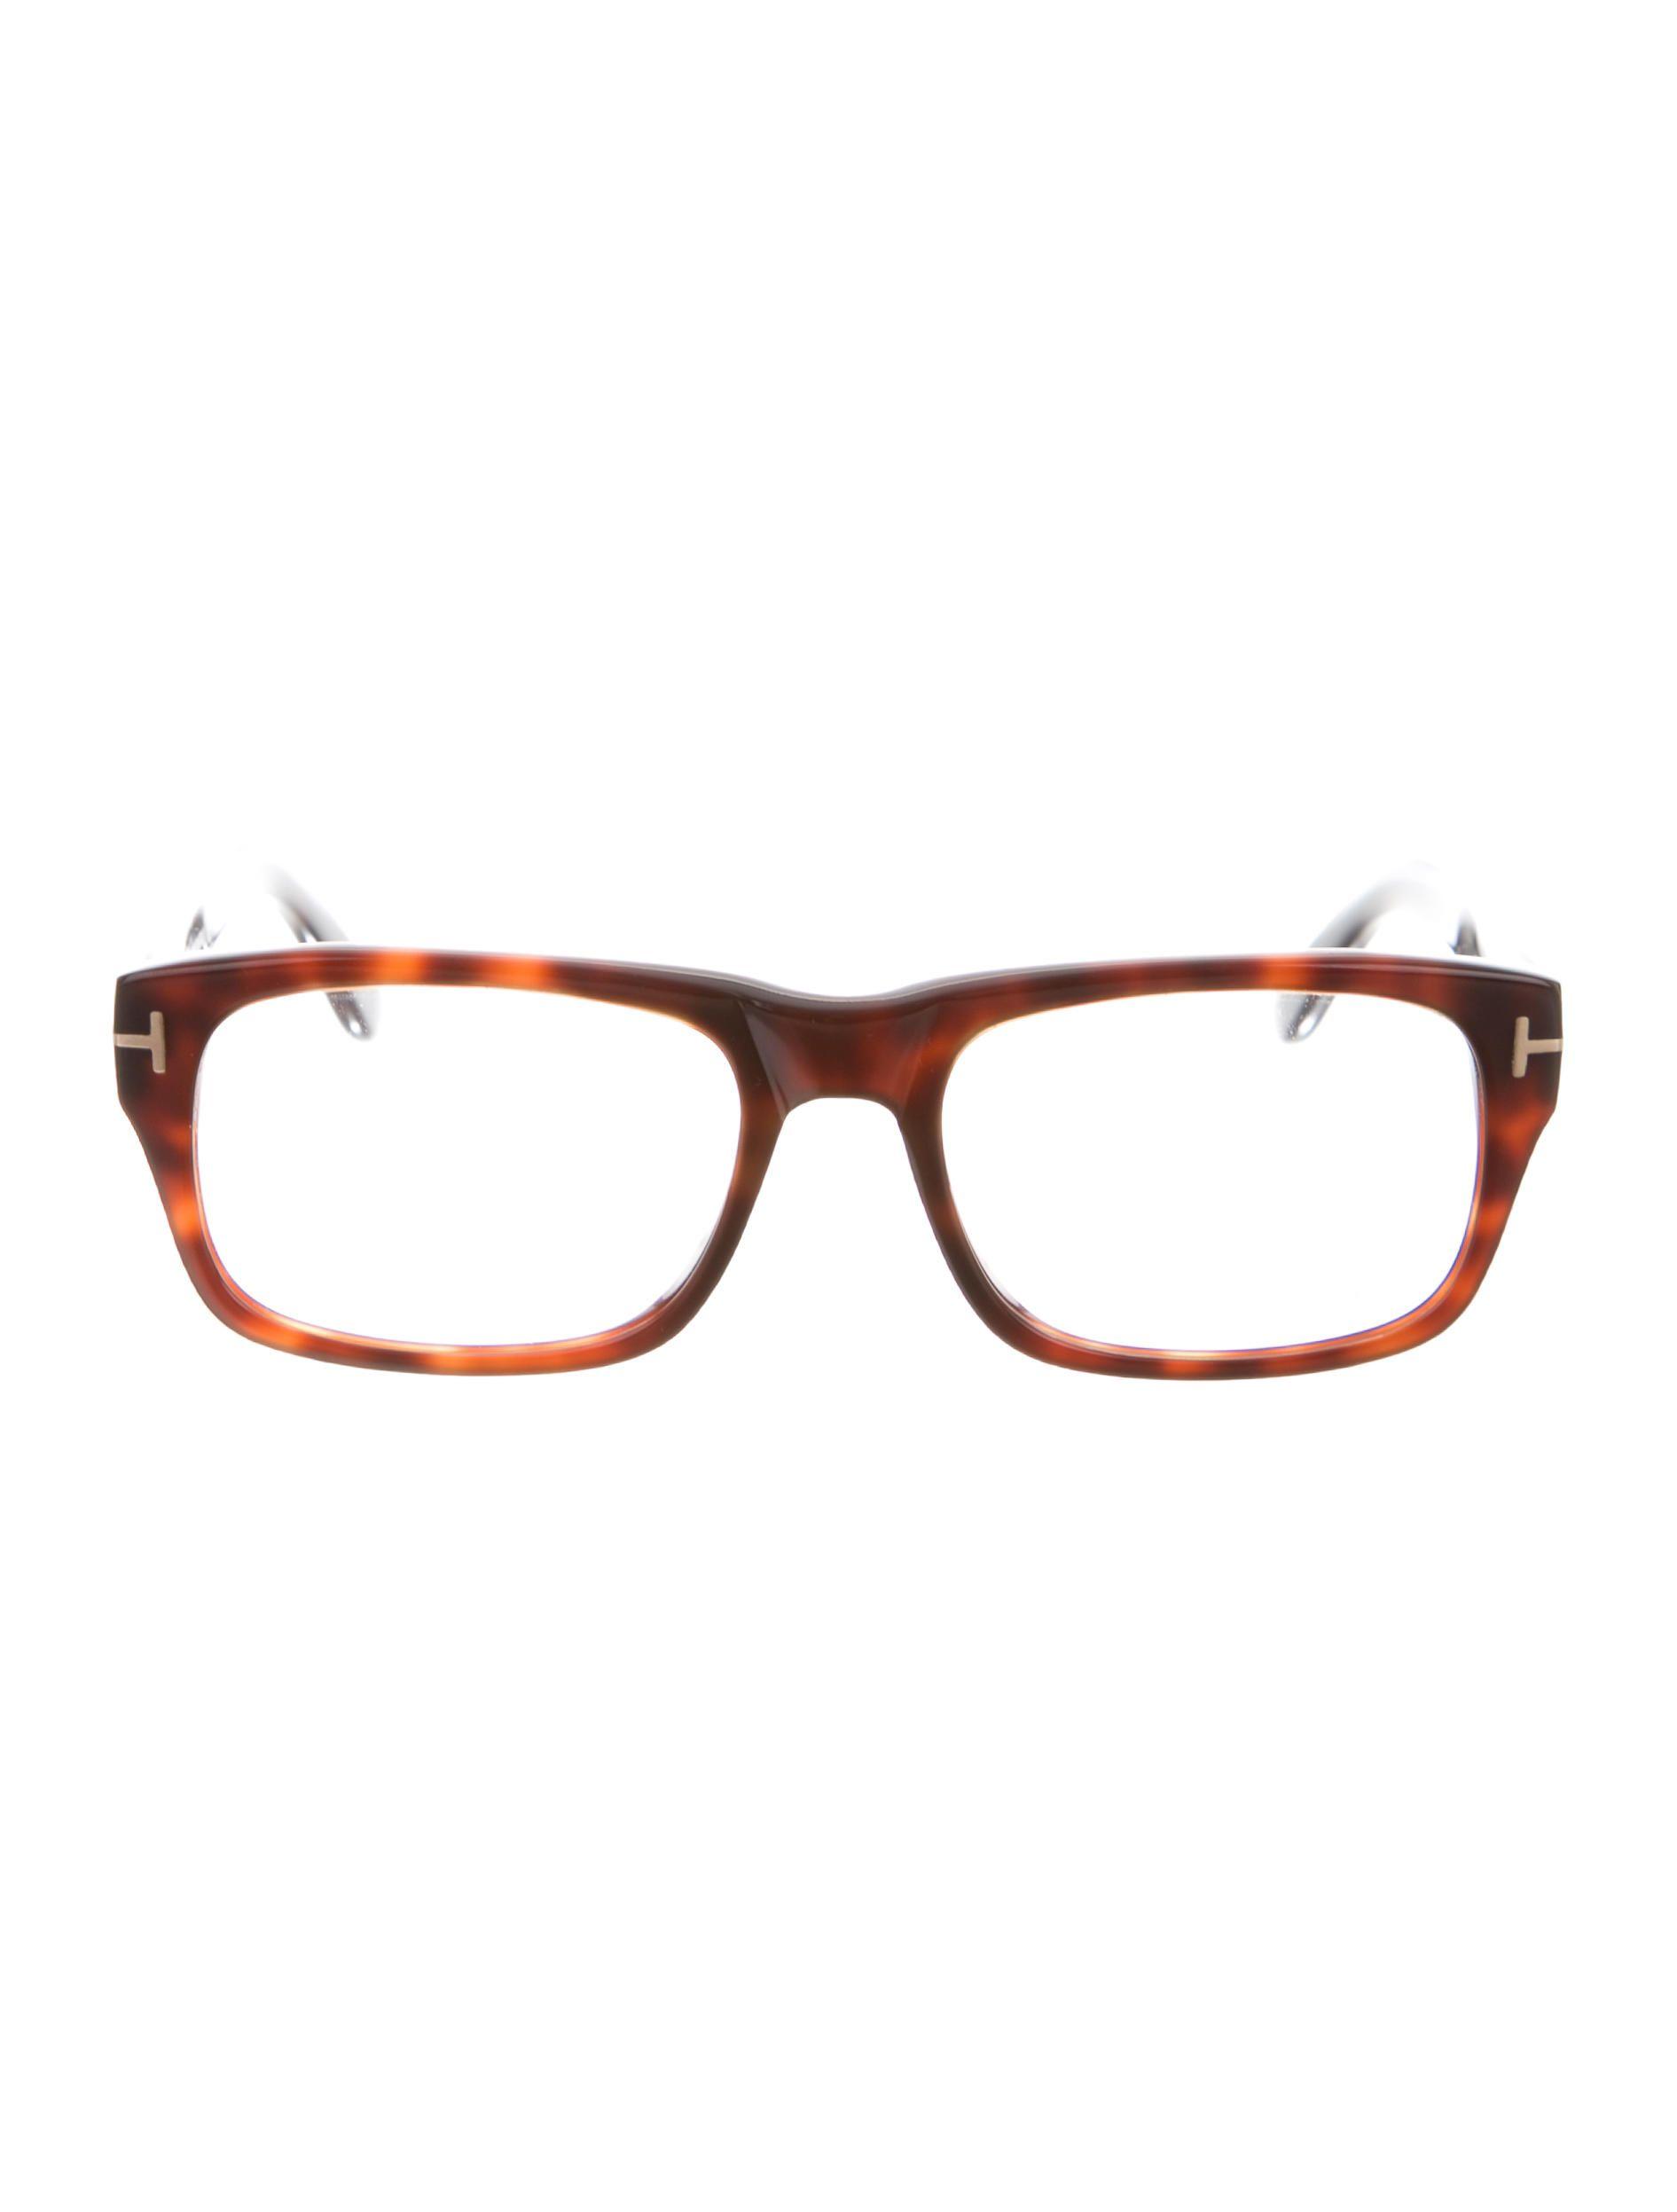 p women sunglasses womens popular s eyeglasses top tom ford